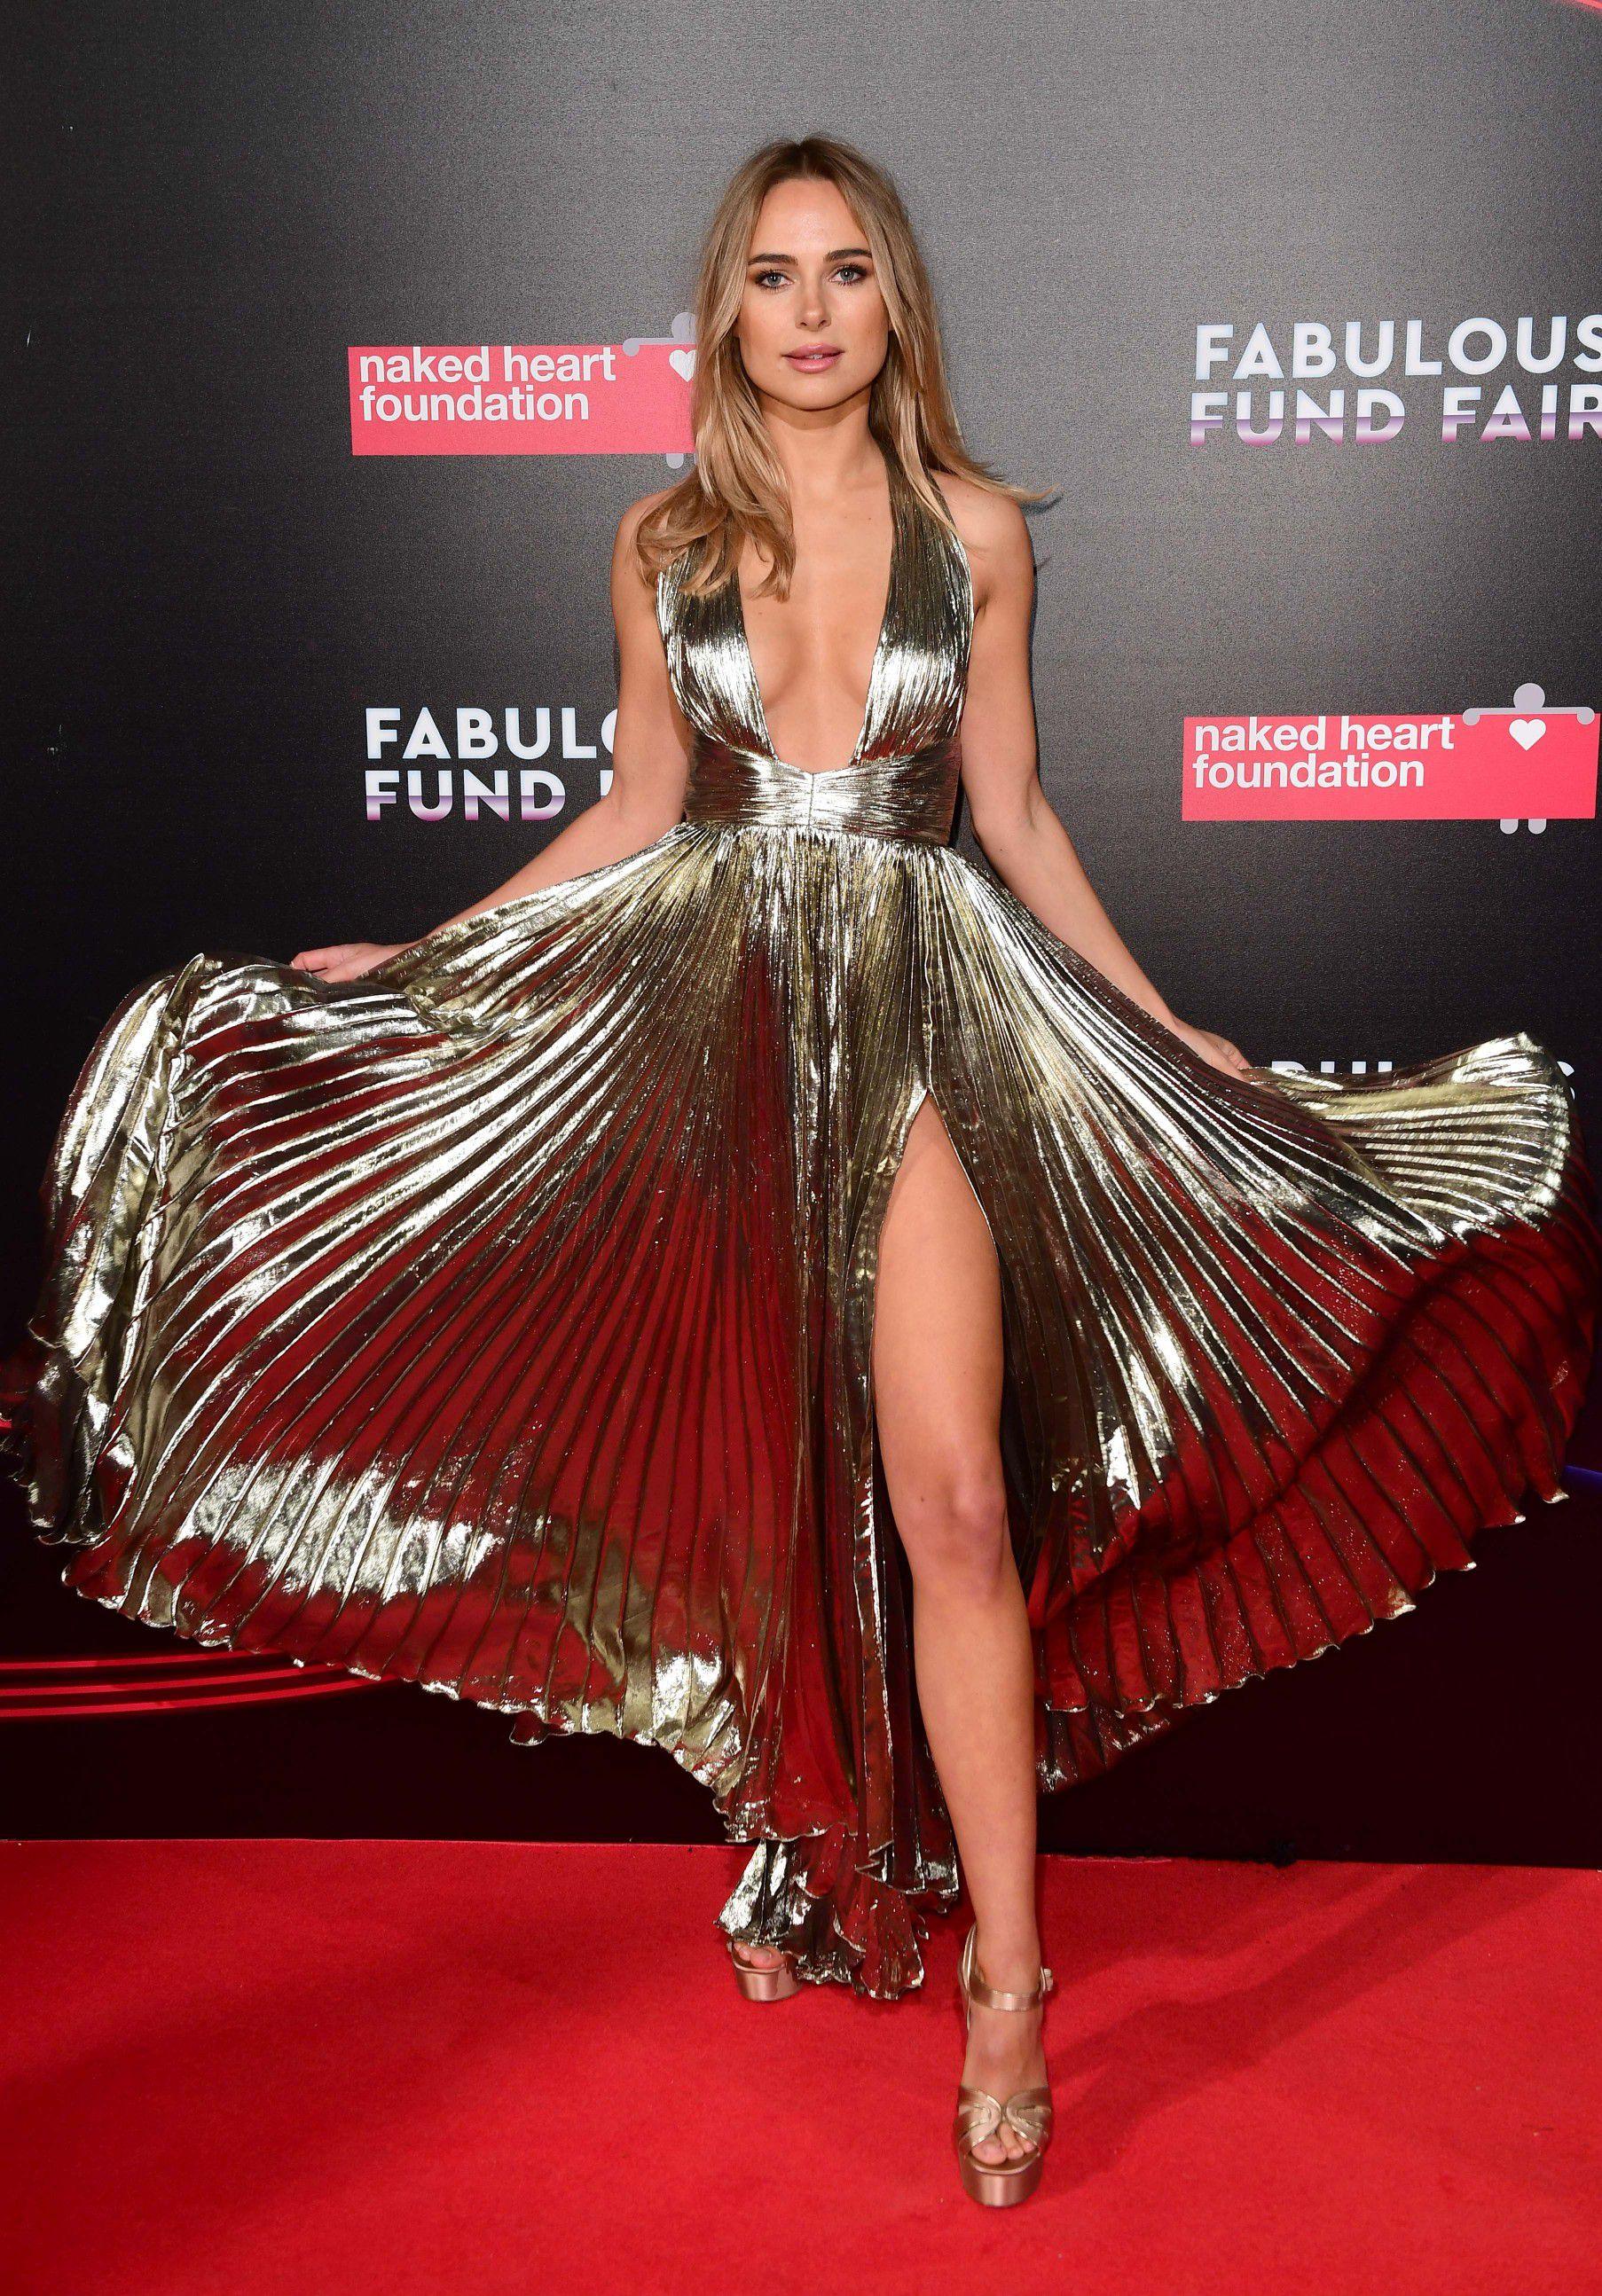 kimberley-garner-cleavage-at-fabulous-fund-fair-in-london-1143